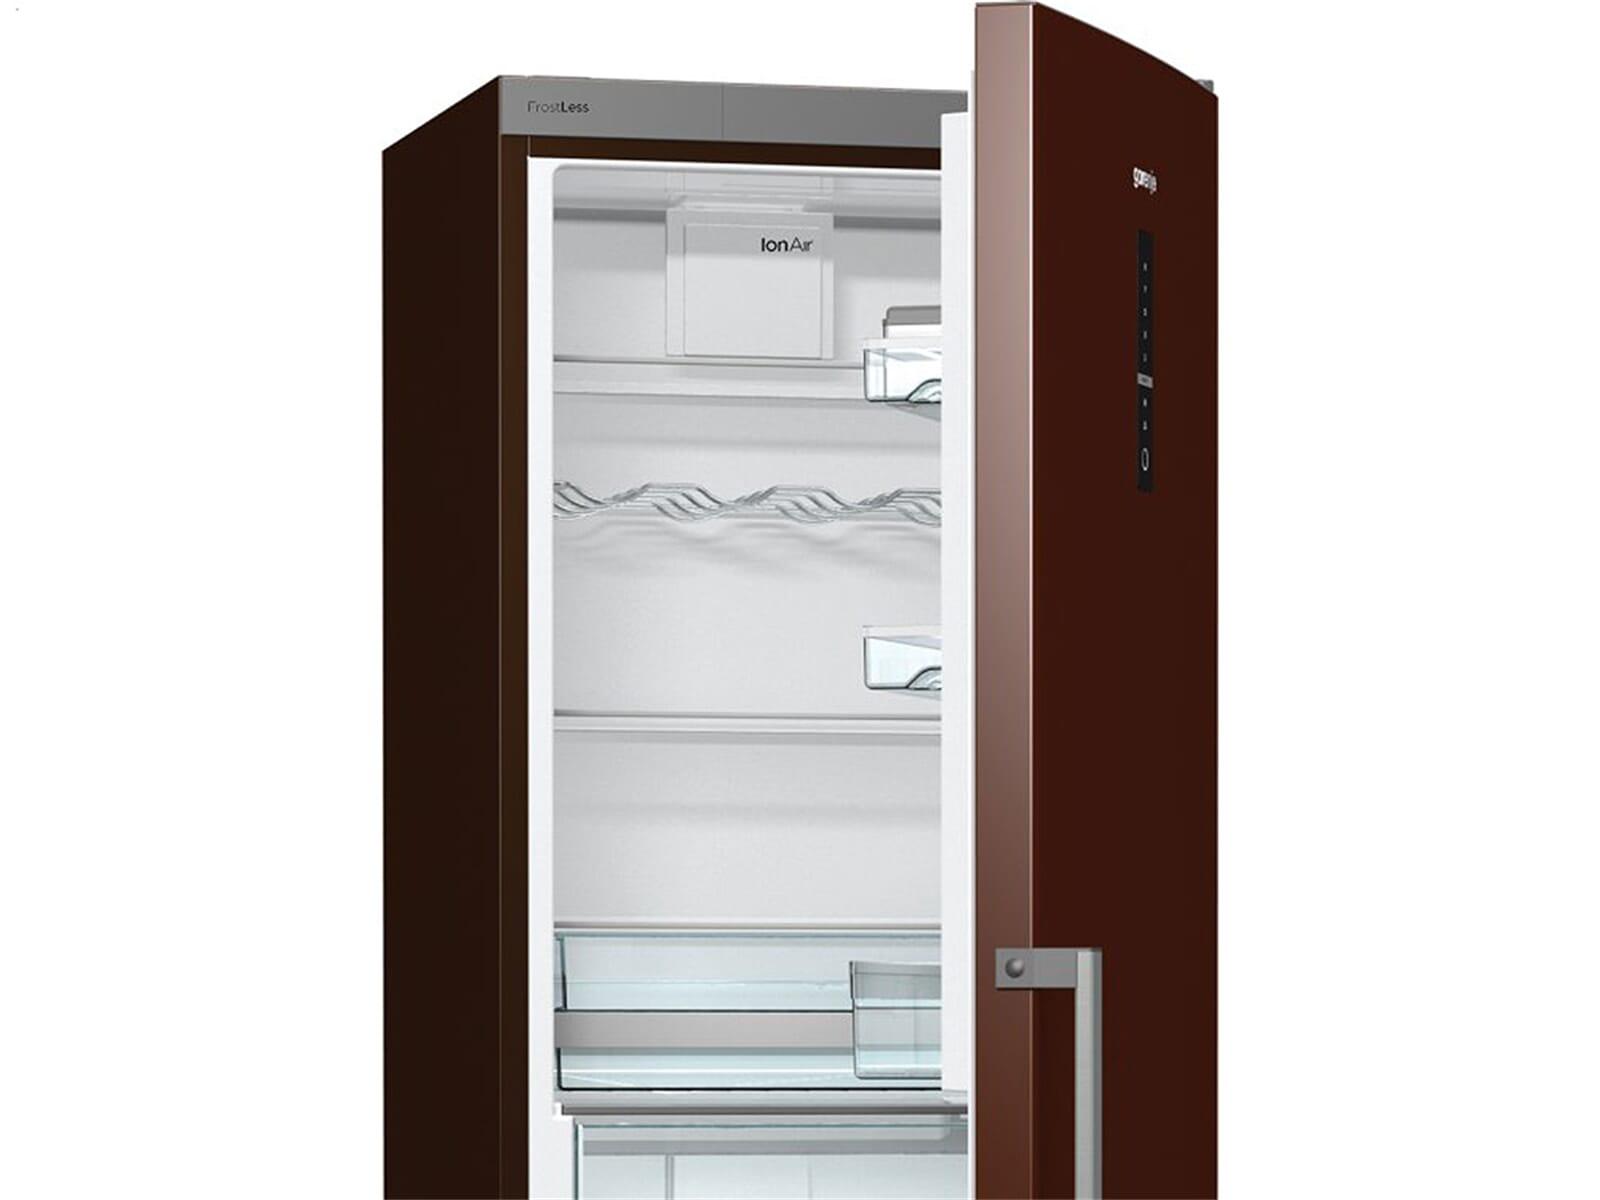 gorenje rk 6193 lch stand k hl gefrier kombination braun k hlschrank chocolate ebay. Black Bedroom Furniture Sets. Home Design Ideas